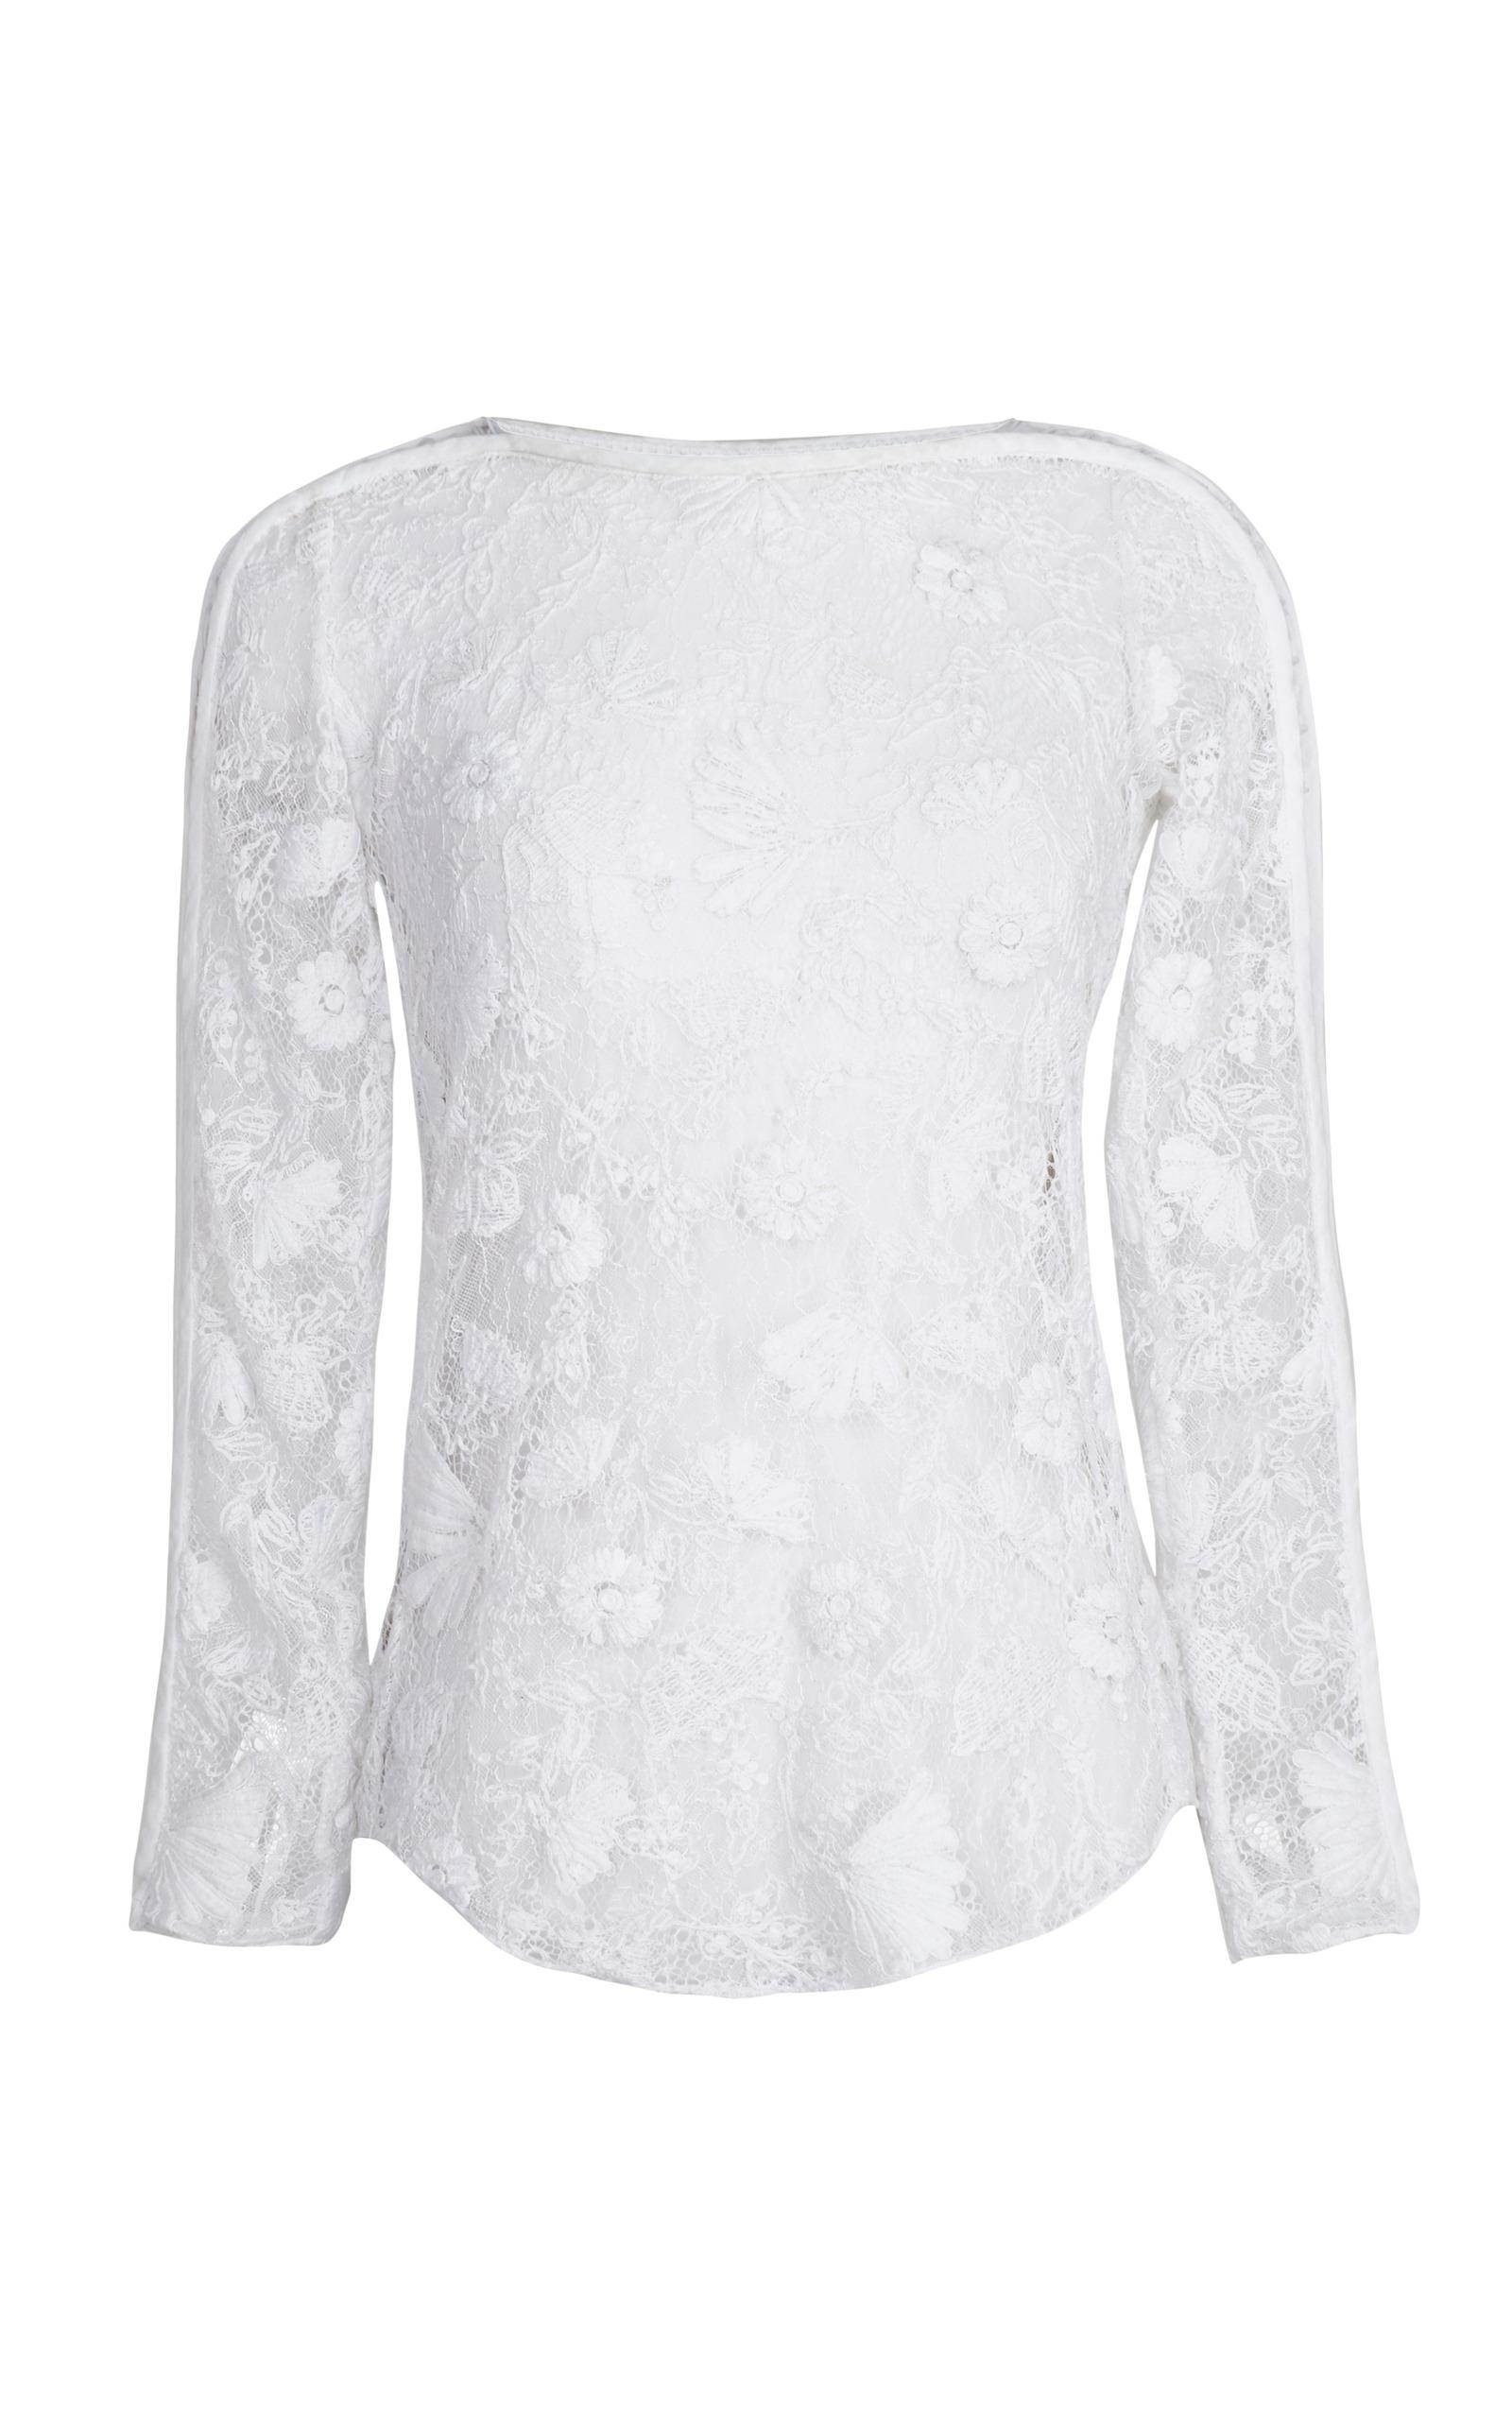 Mora top - White Isabel Marant Cheap Sale Buy Sale Pick A Best PjySMlH5